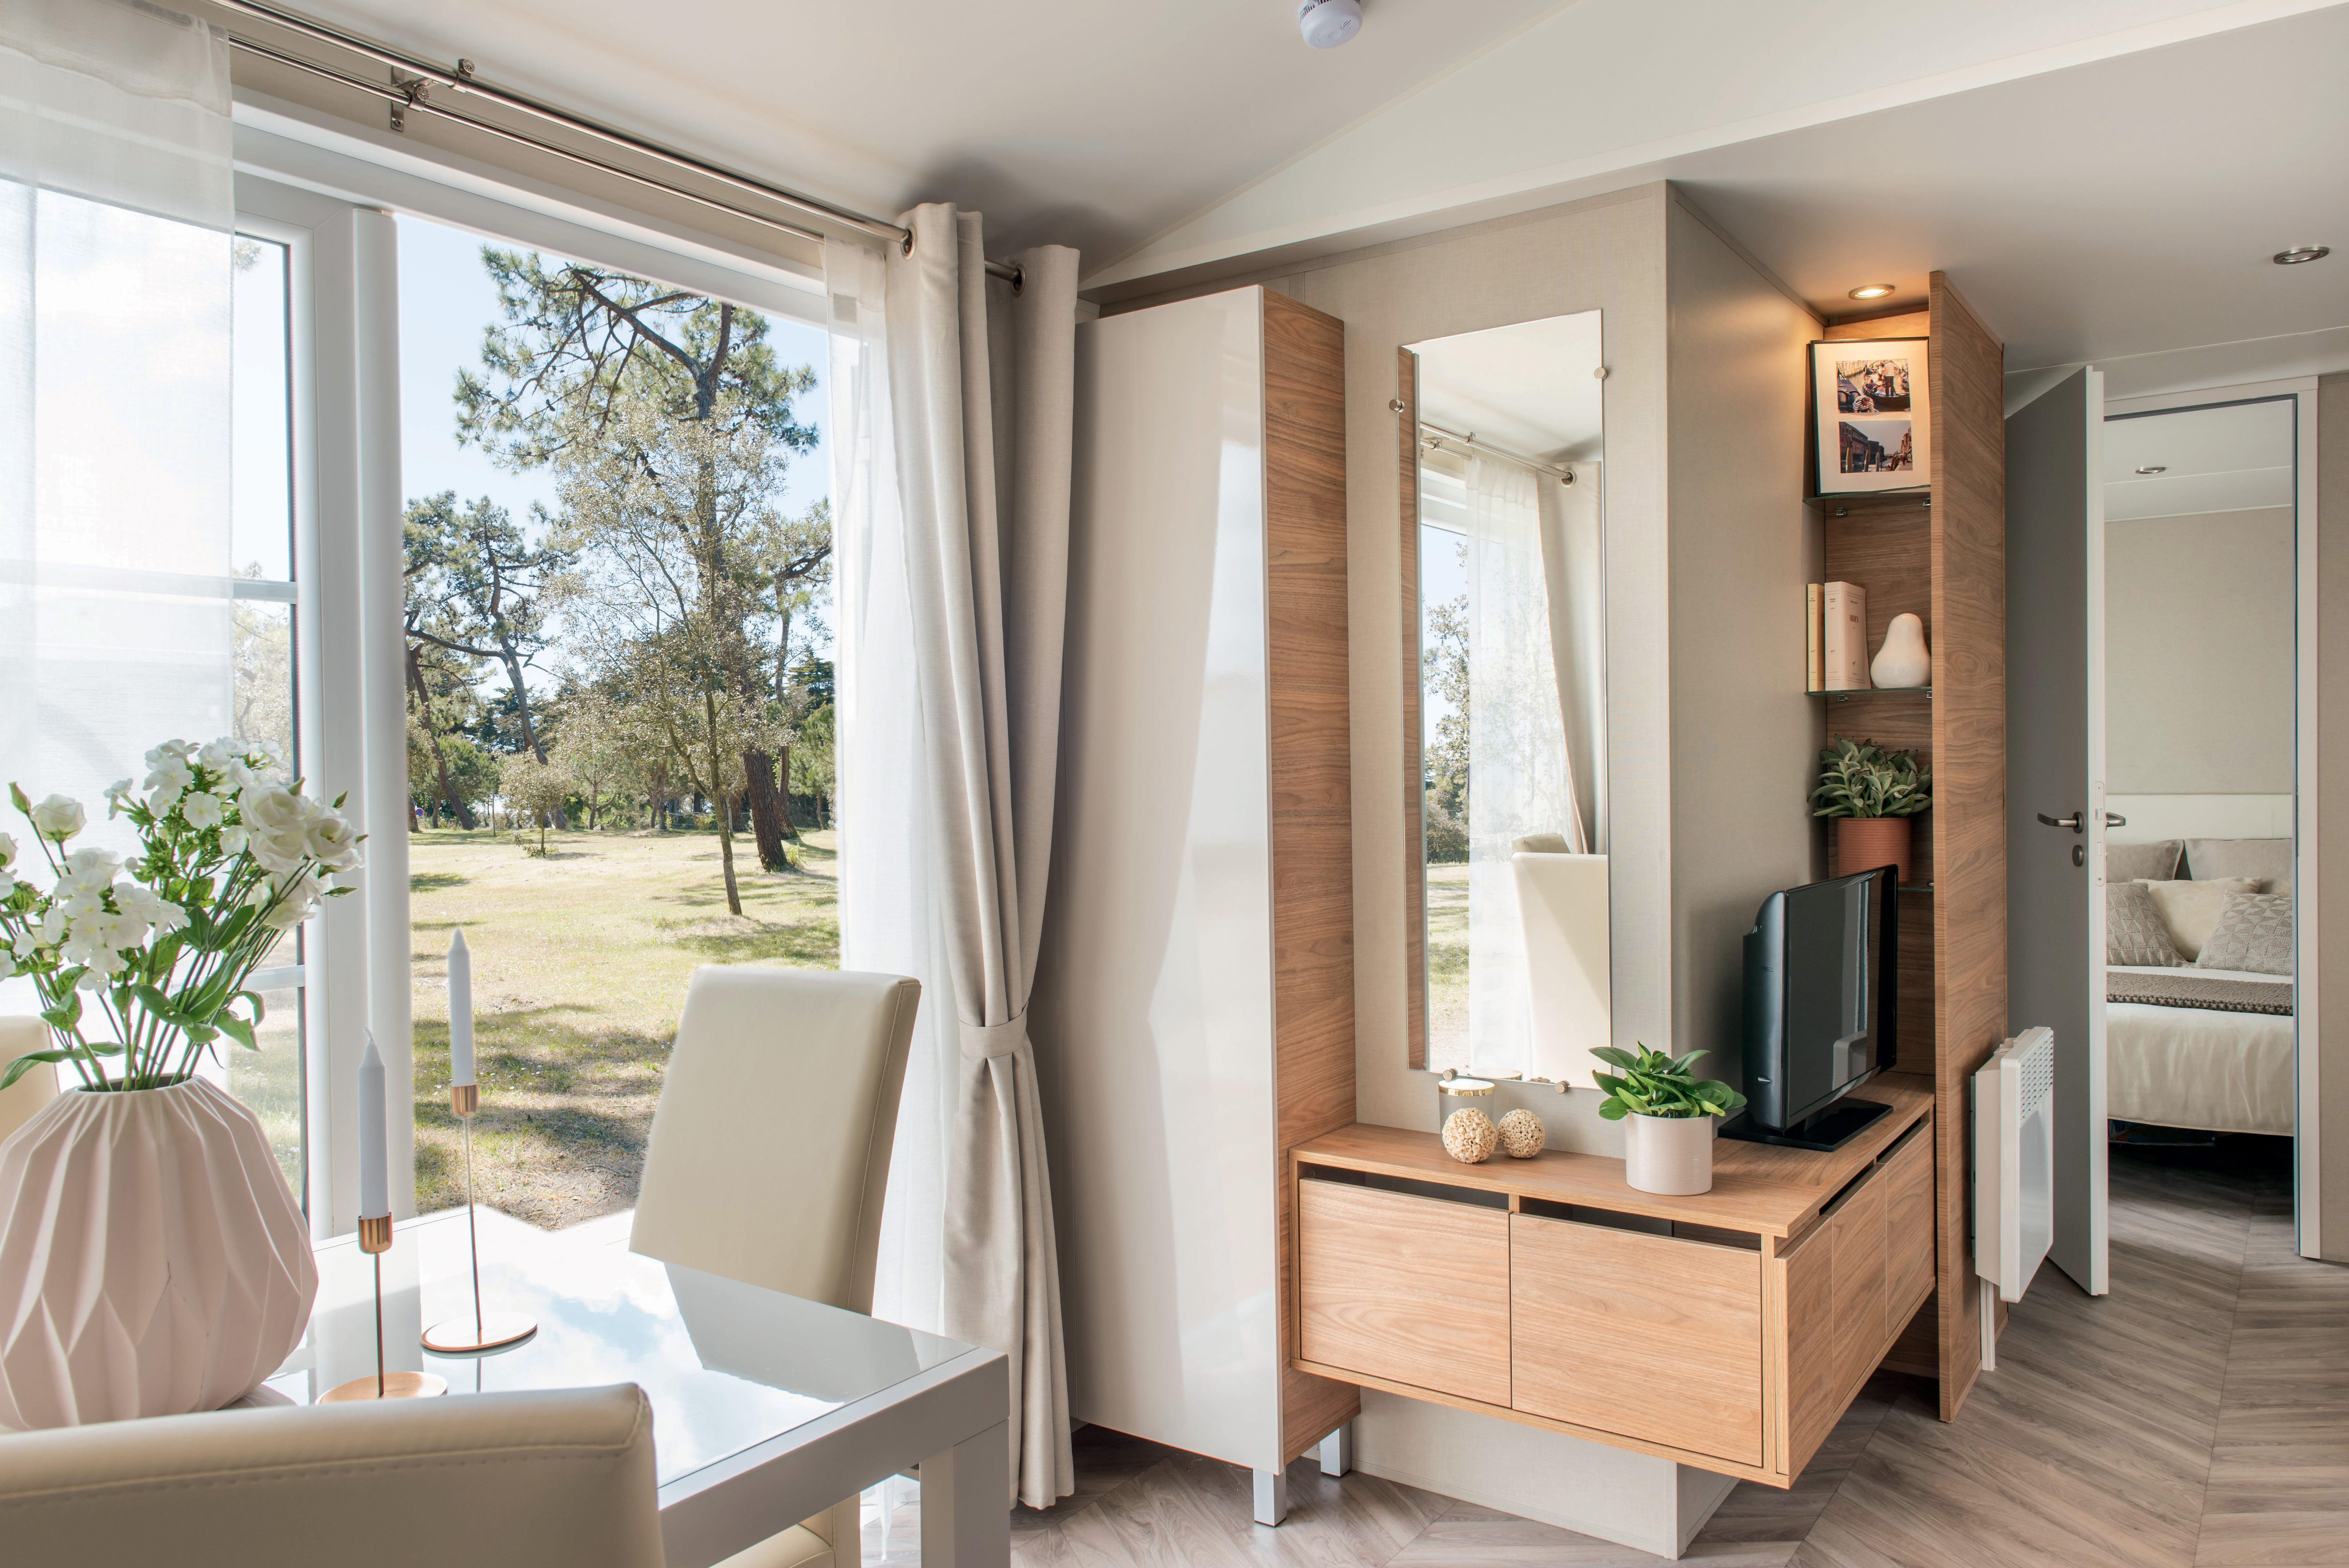 irm long island 3 mobil home neuf residentiel zen mobilhome. Black Bedroom Furniture Sets. Home Design Ideas